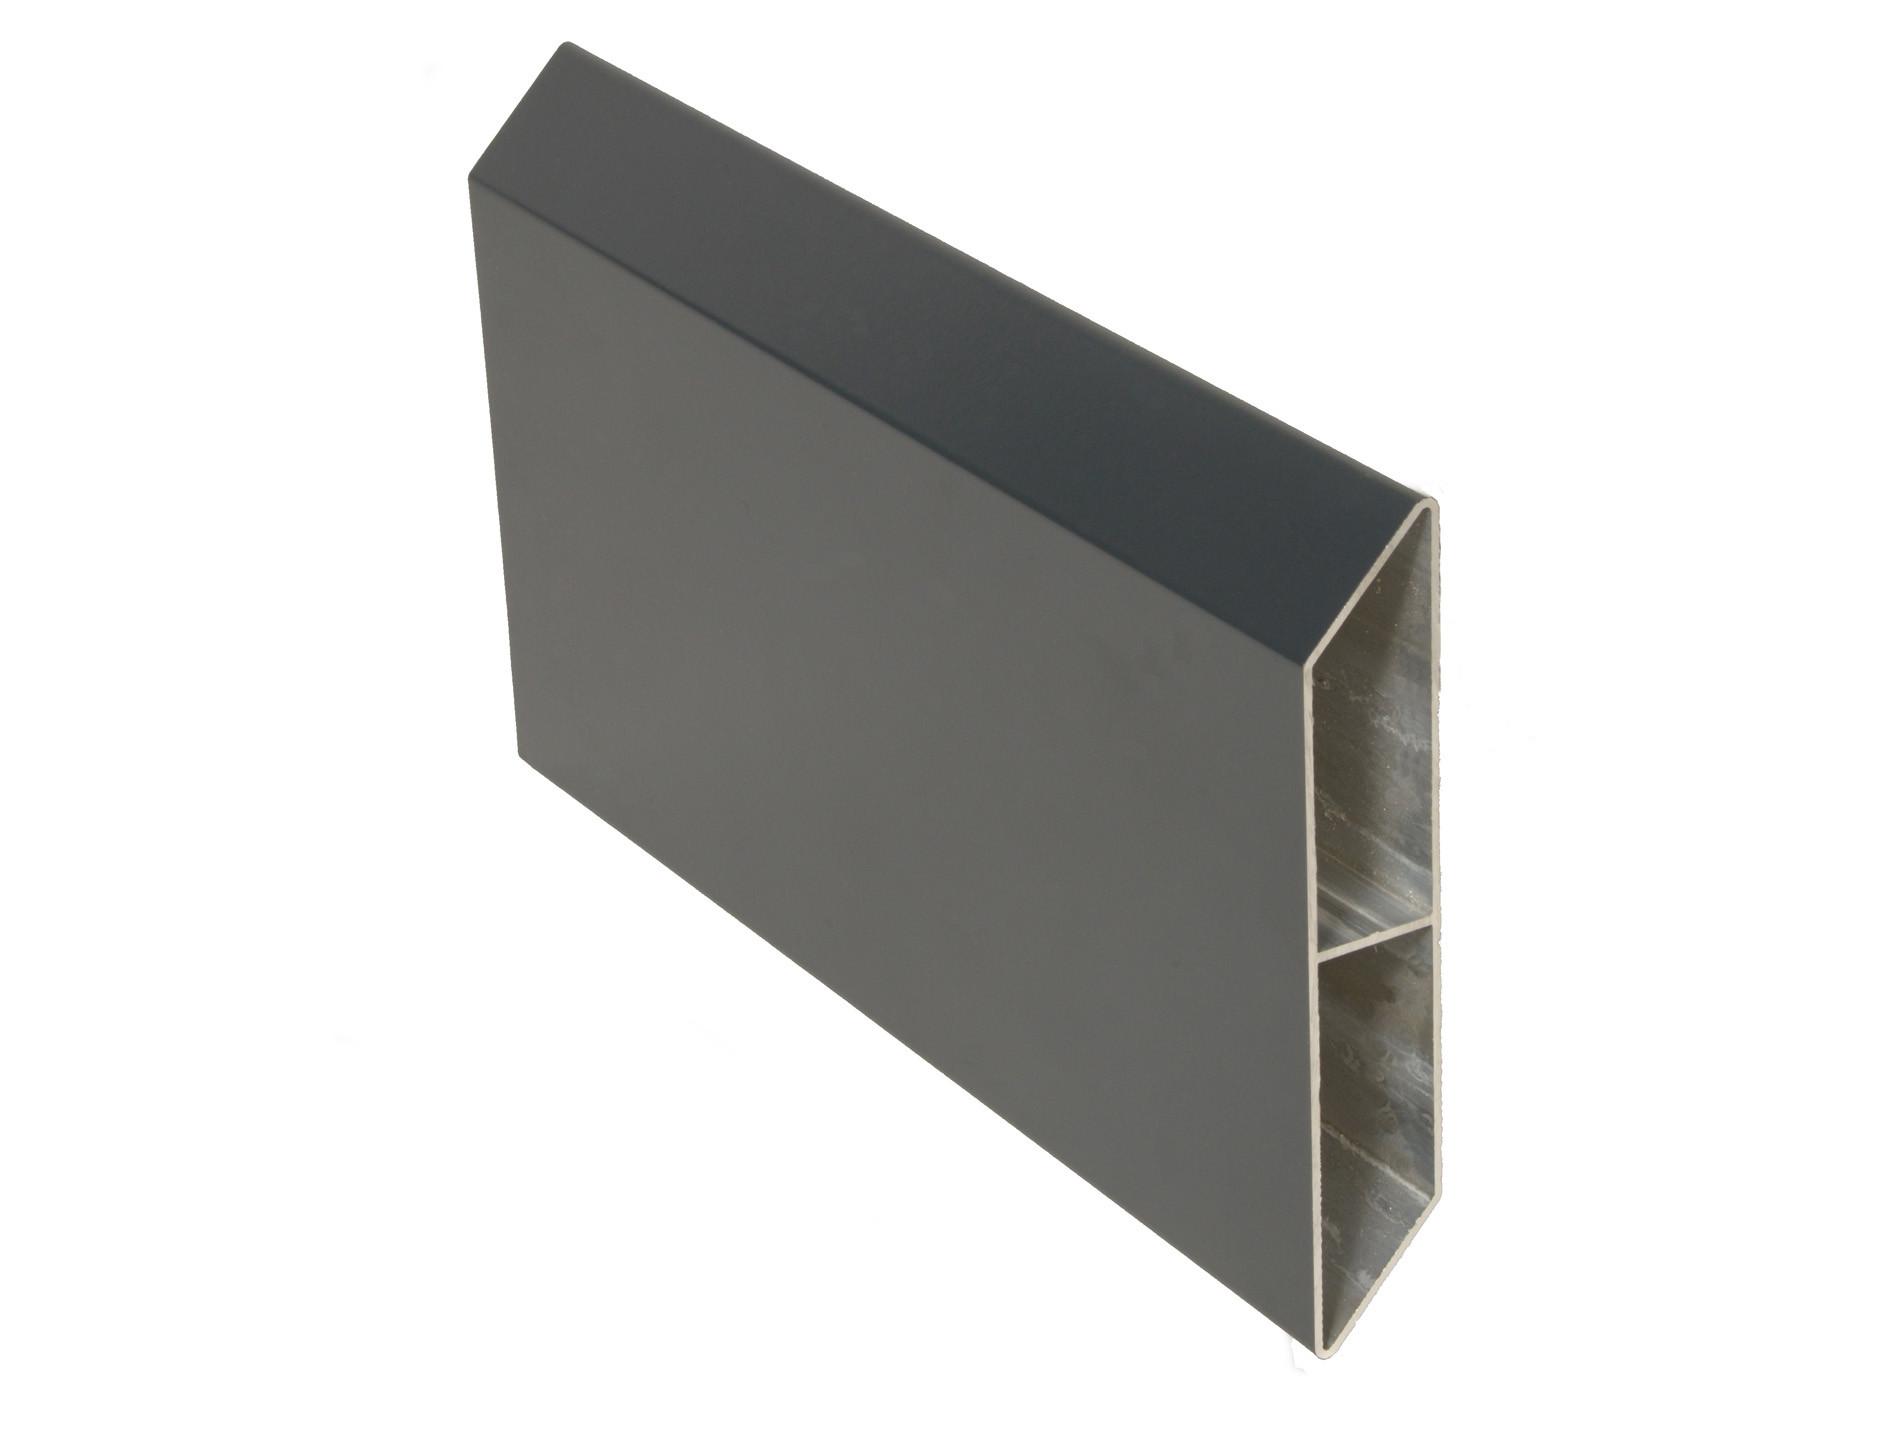 Lame palissade alu gris clair 2m